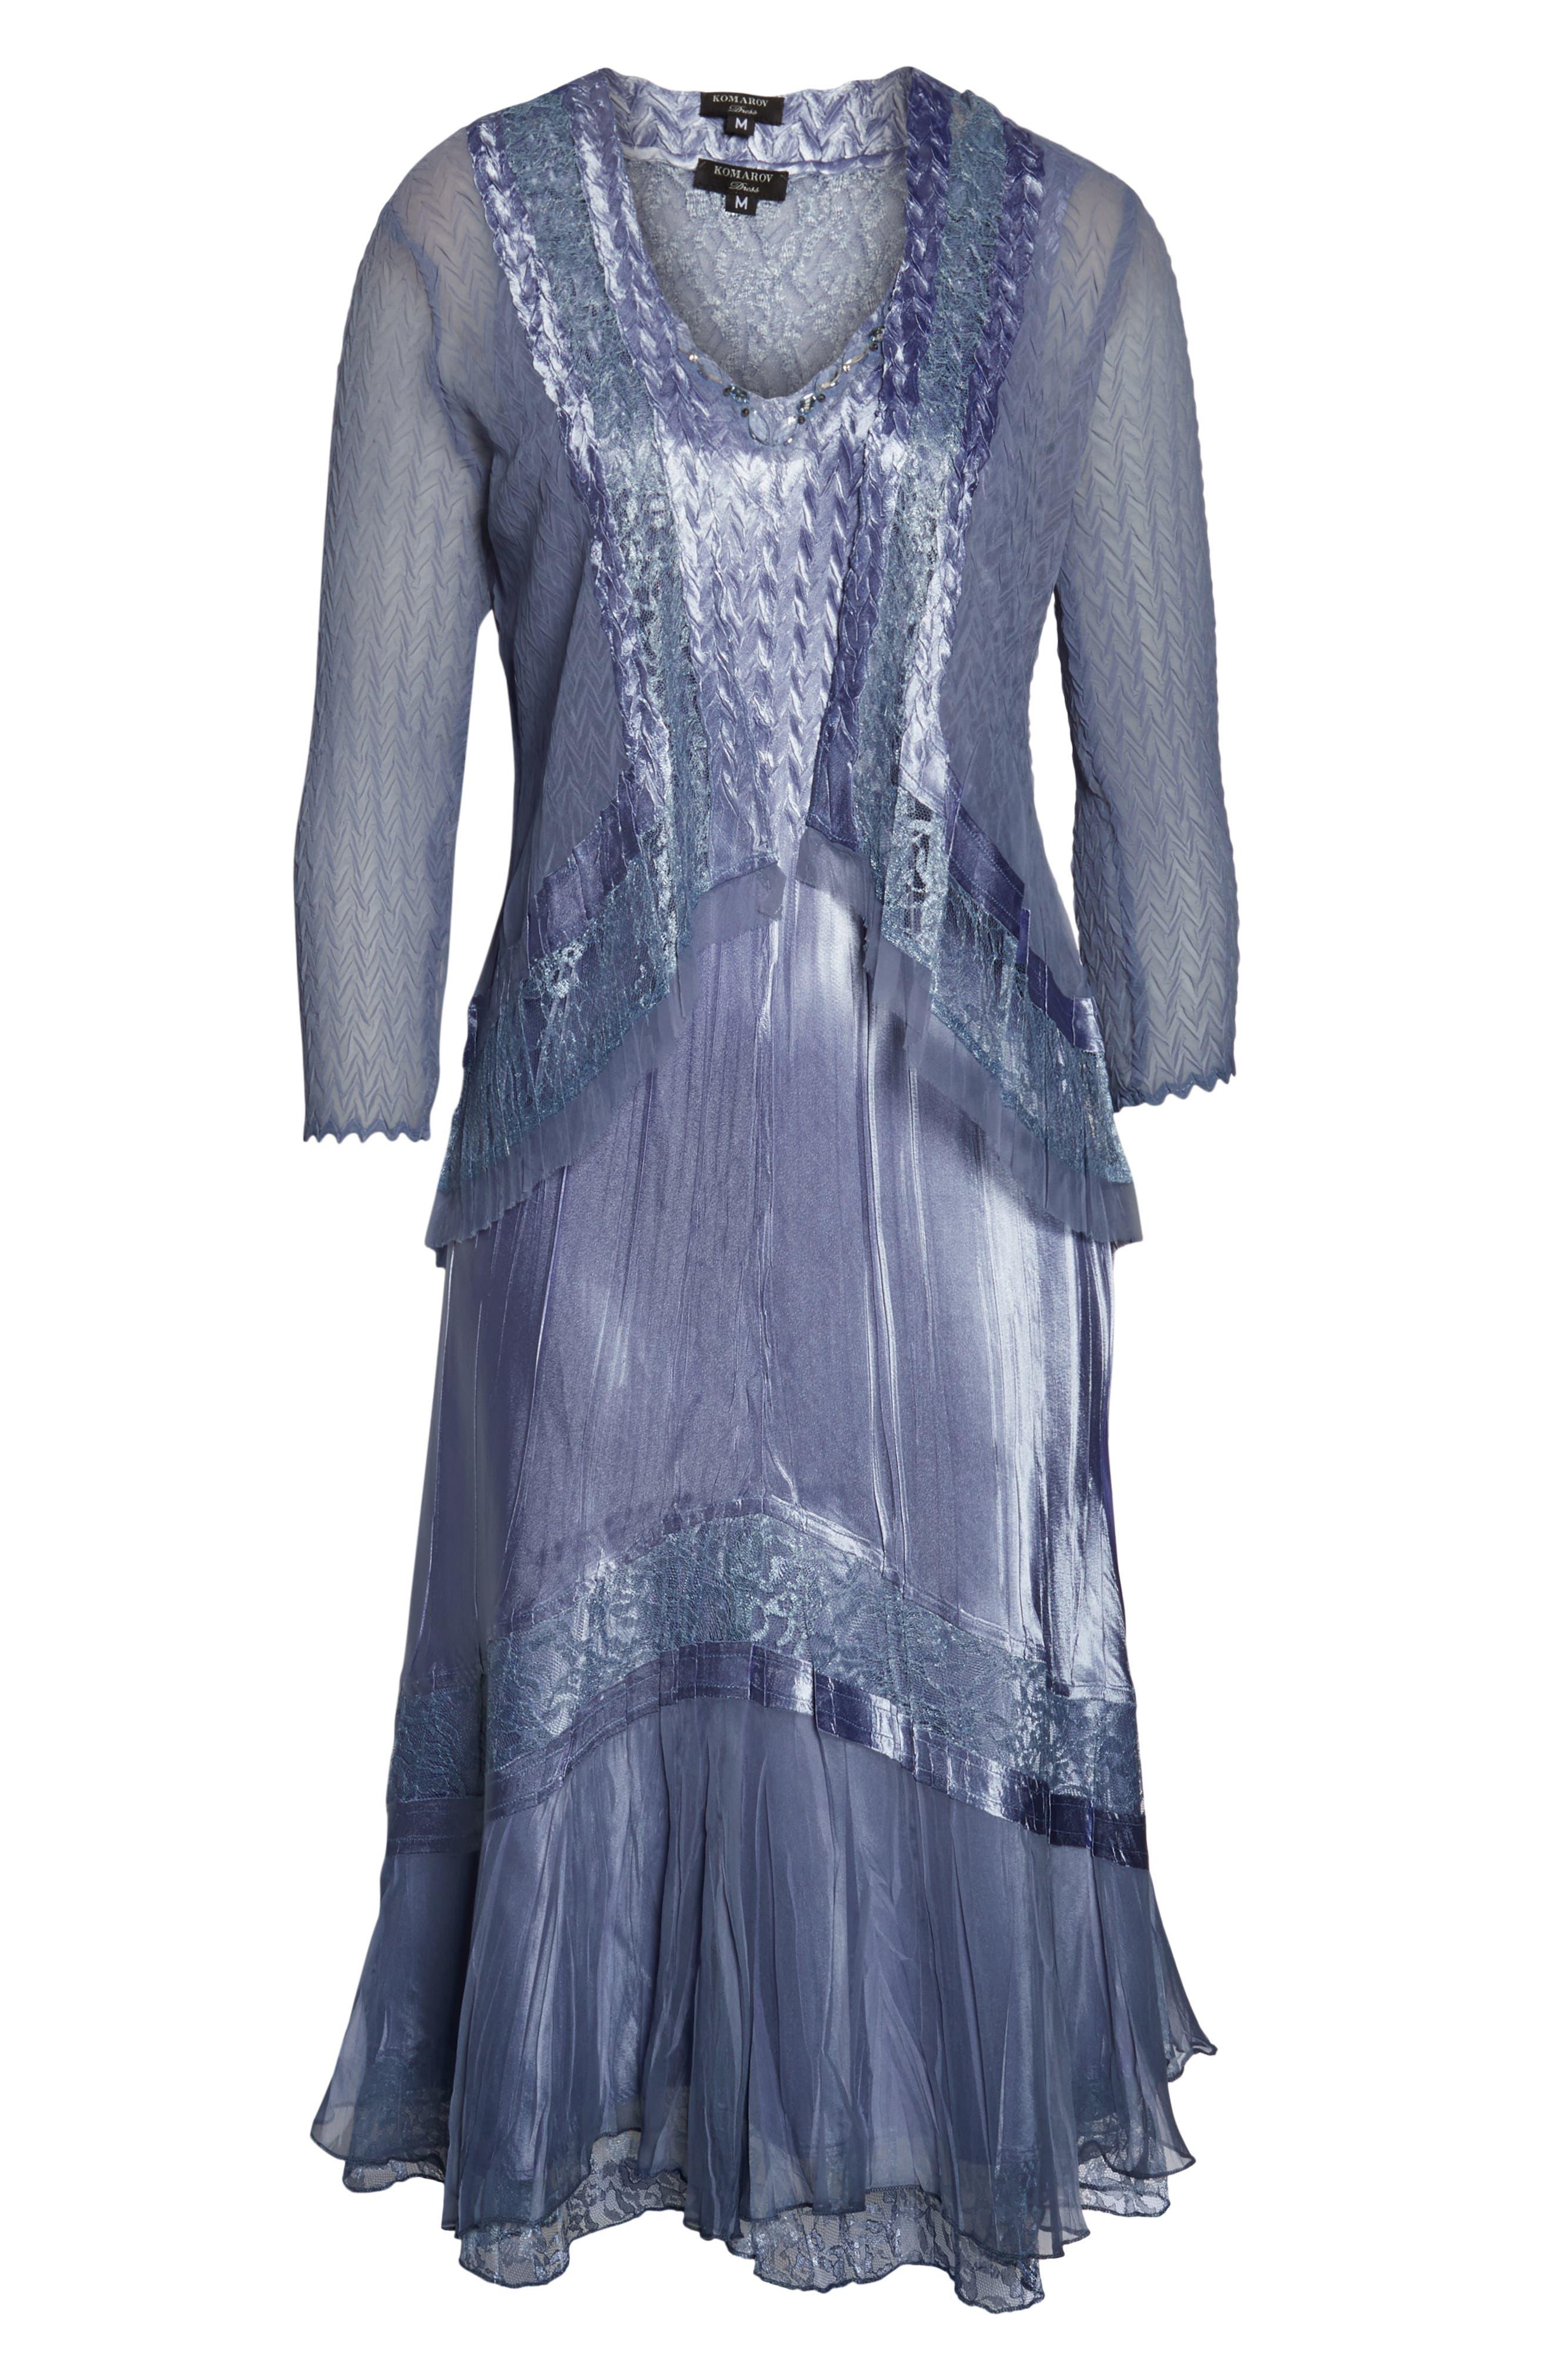 KOMAROV, Embellished Lace Trim Charmeuse Dress & Jacket, Alternate thumbnail 2, color, 500